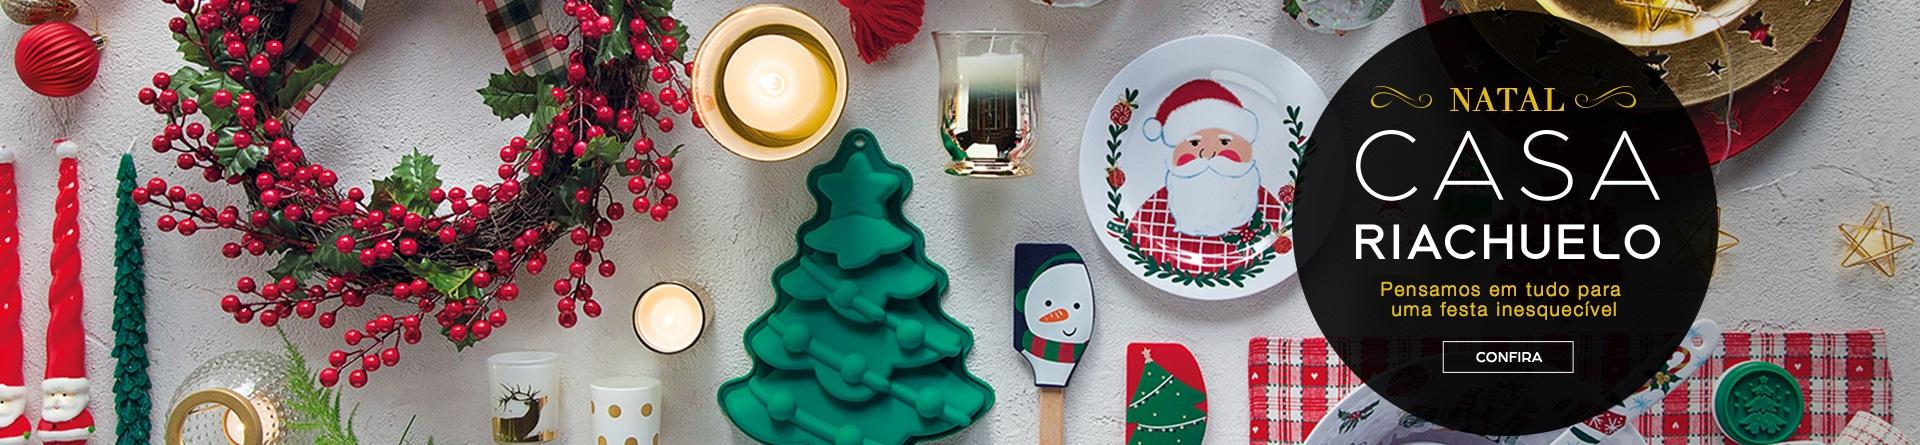 Natal Casa Riachuelo